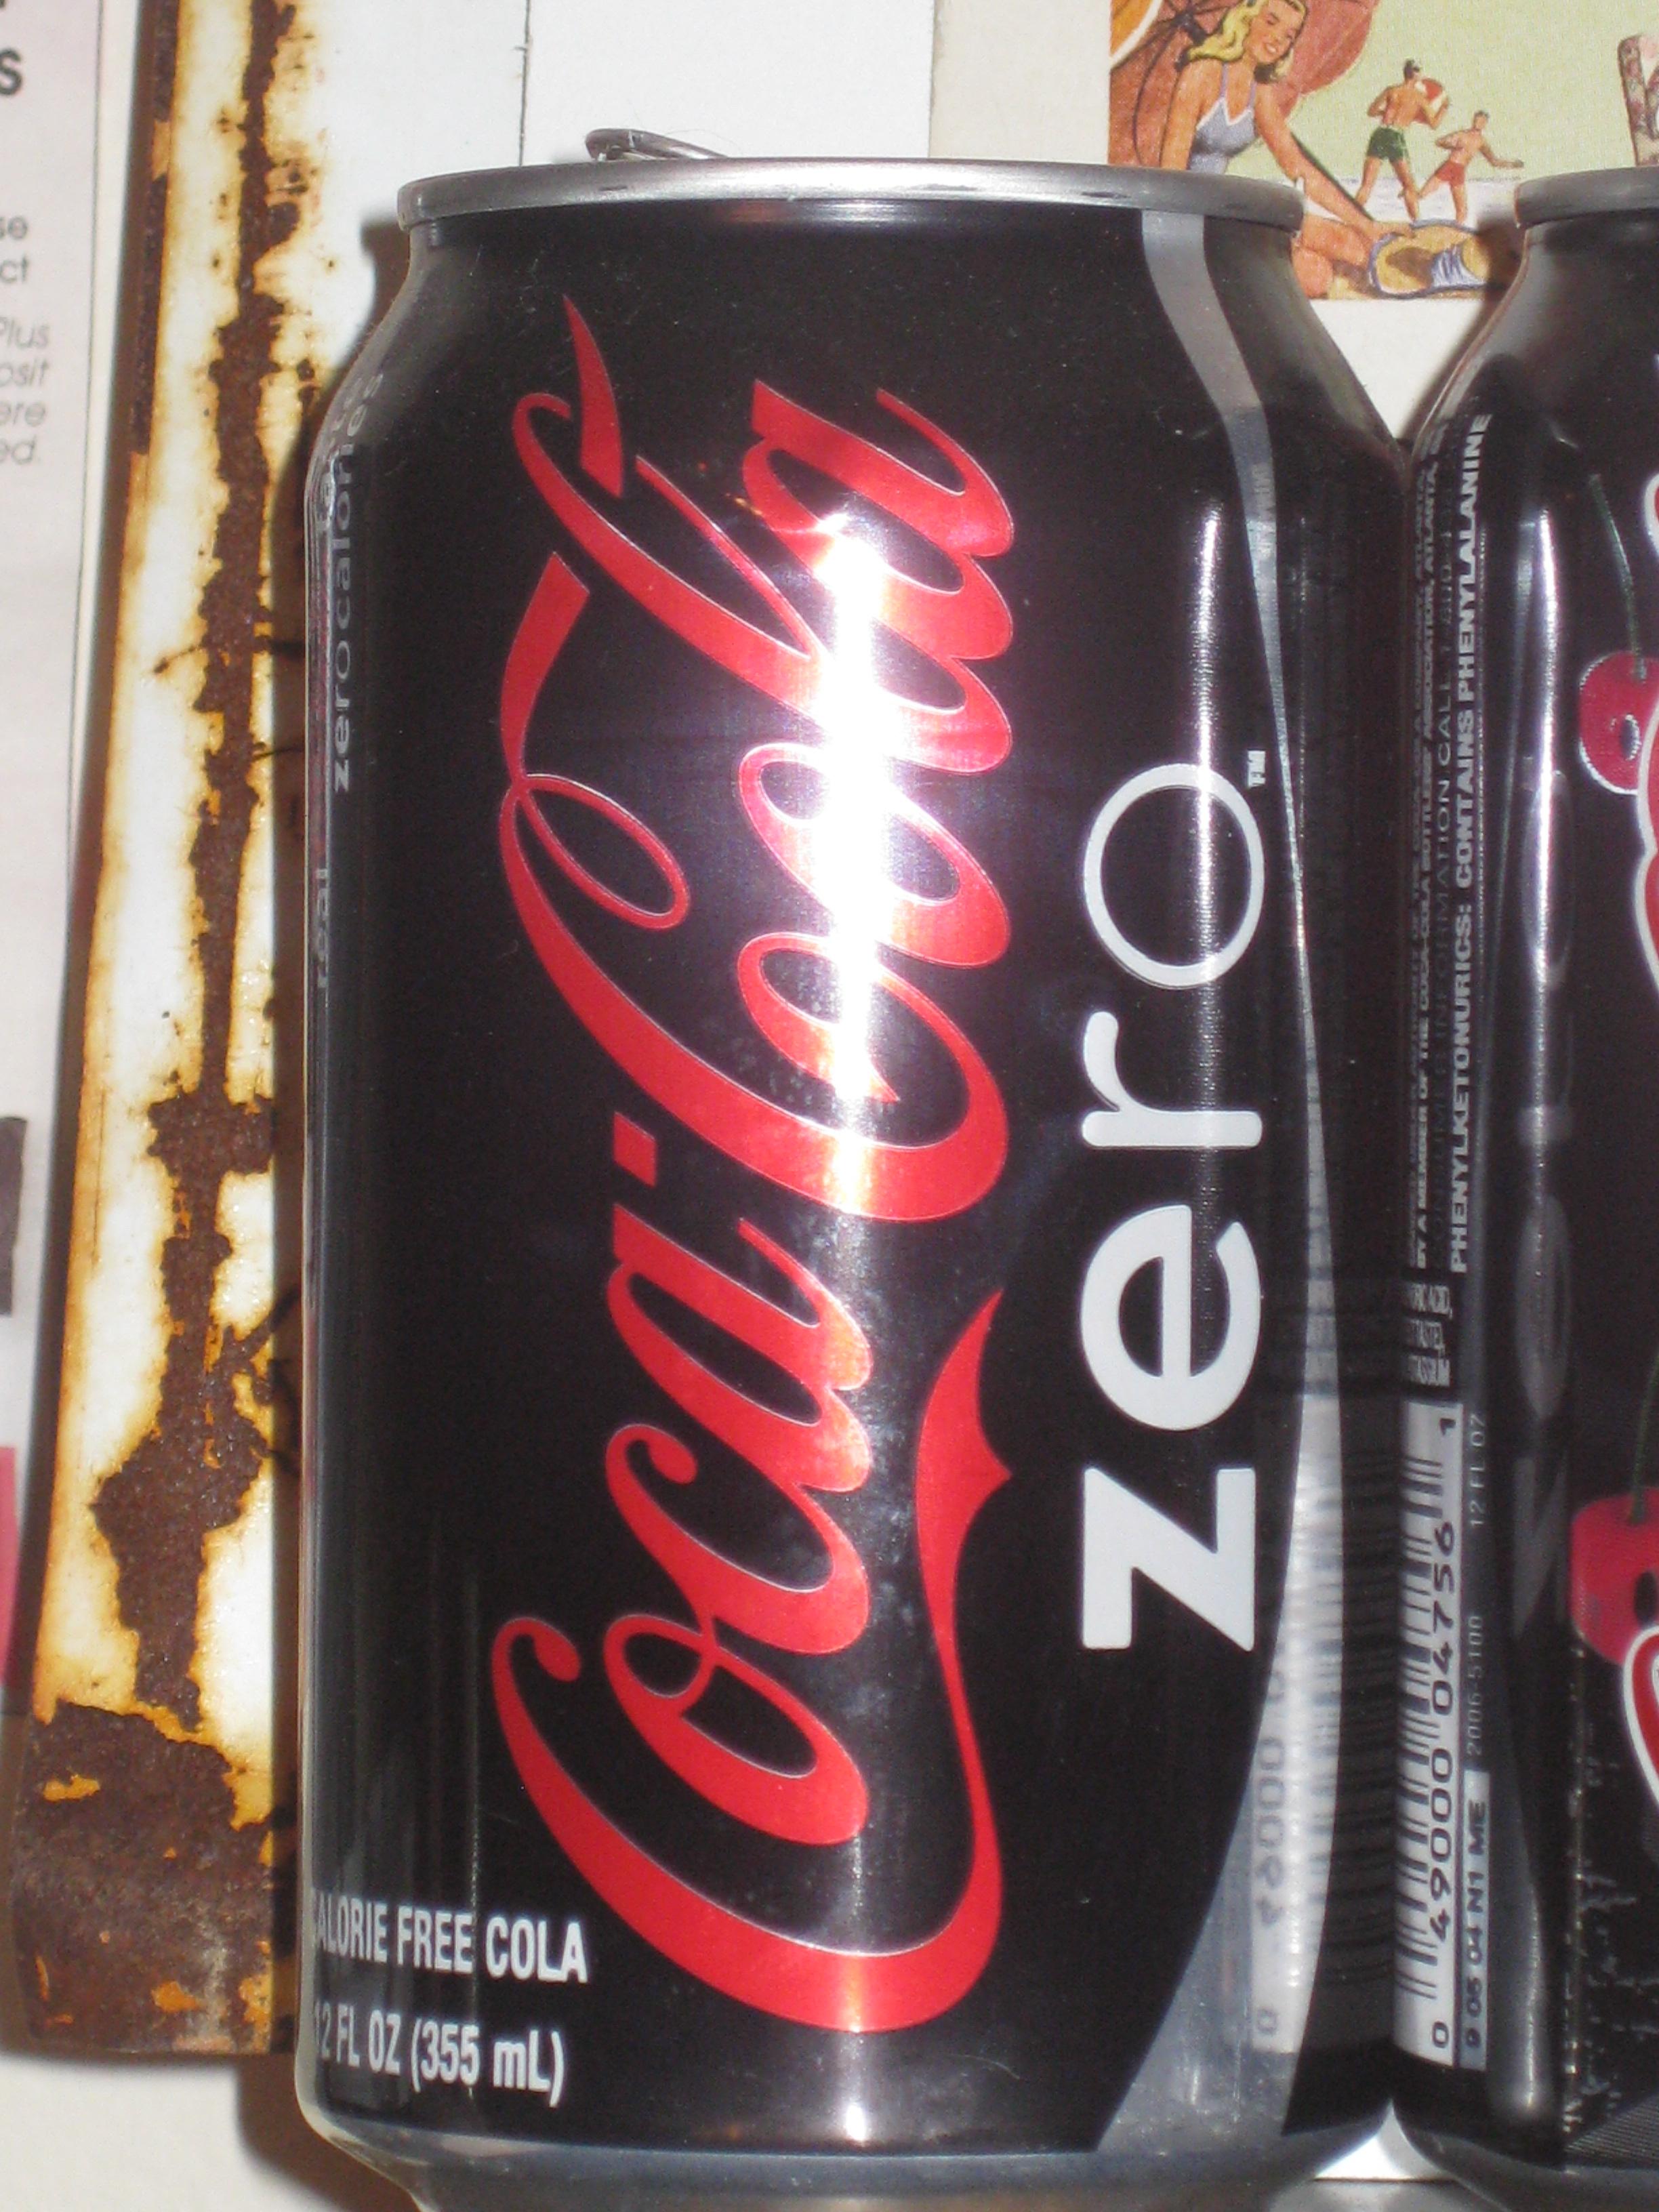 File:CokeZero JPG - Wikimedia Commons